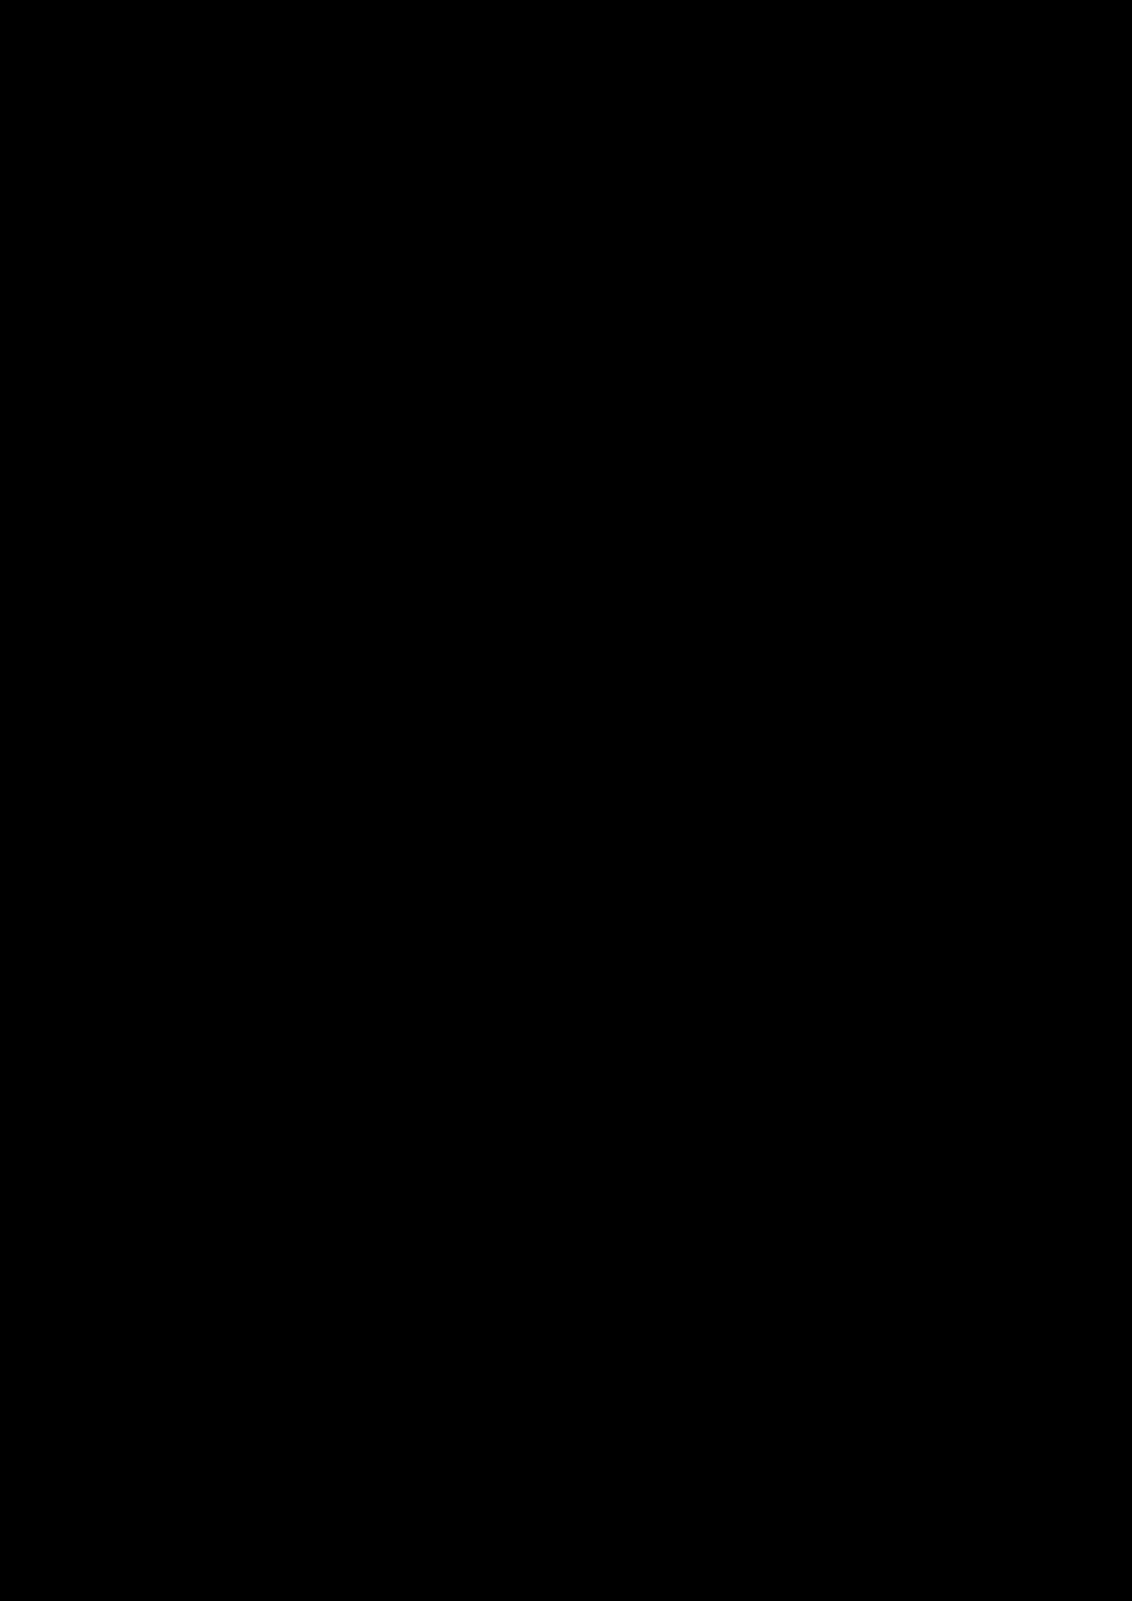 Belyiy sokol slide, Image 195